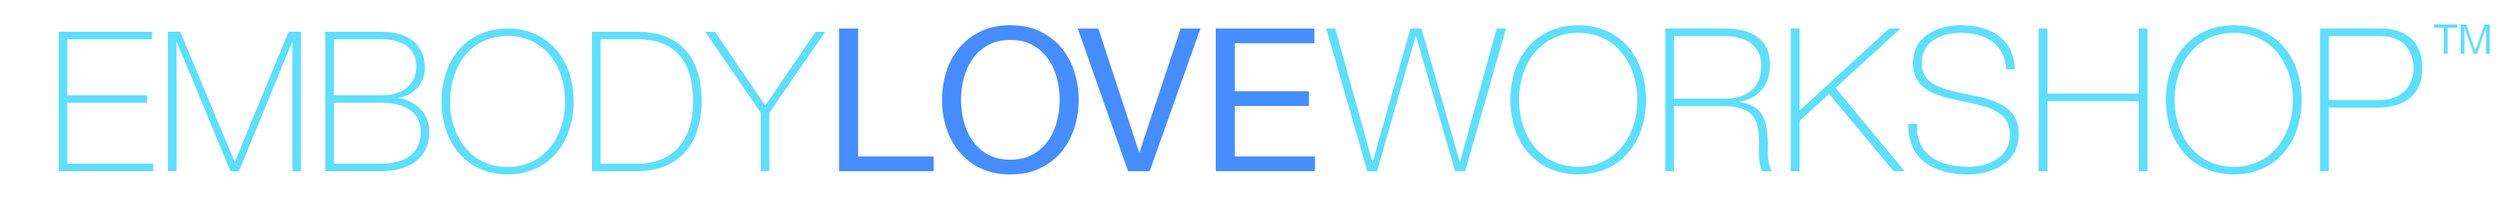 Embody-Love-Workshop-Logo.jpg